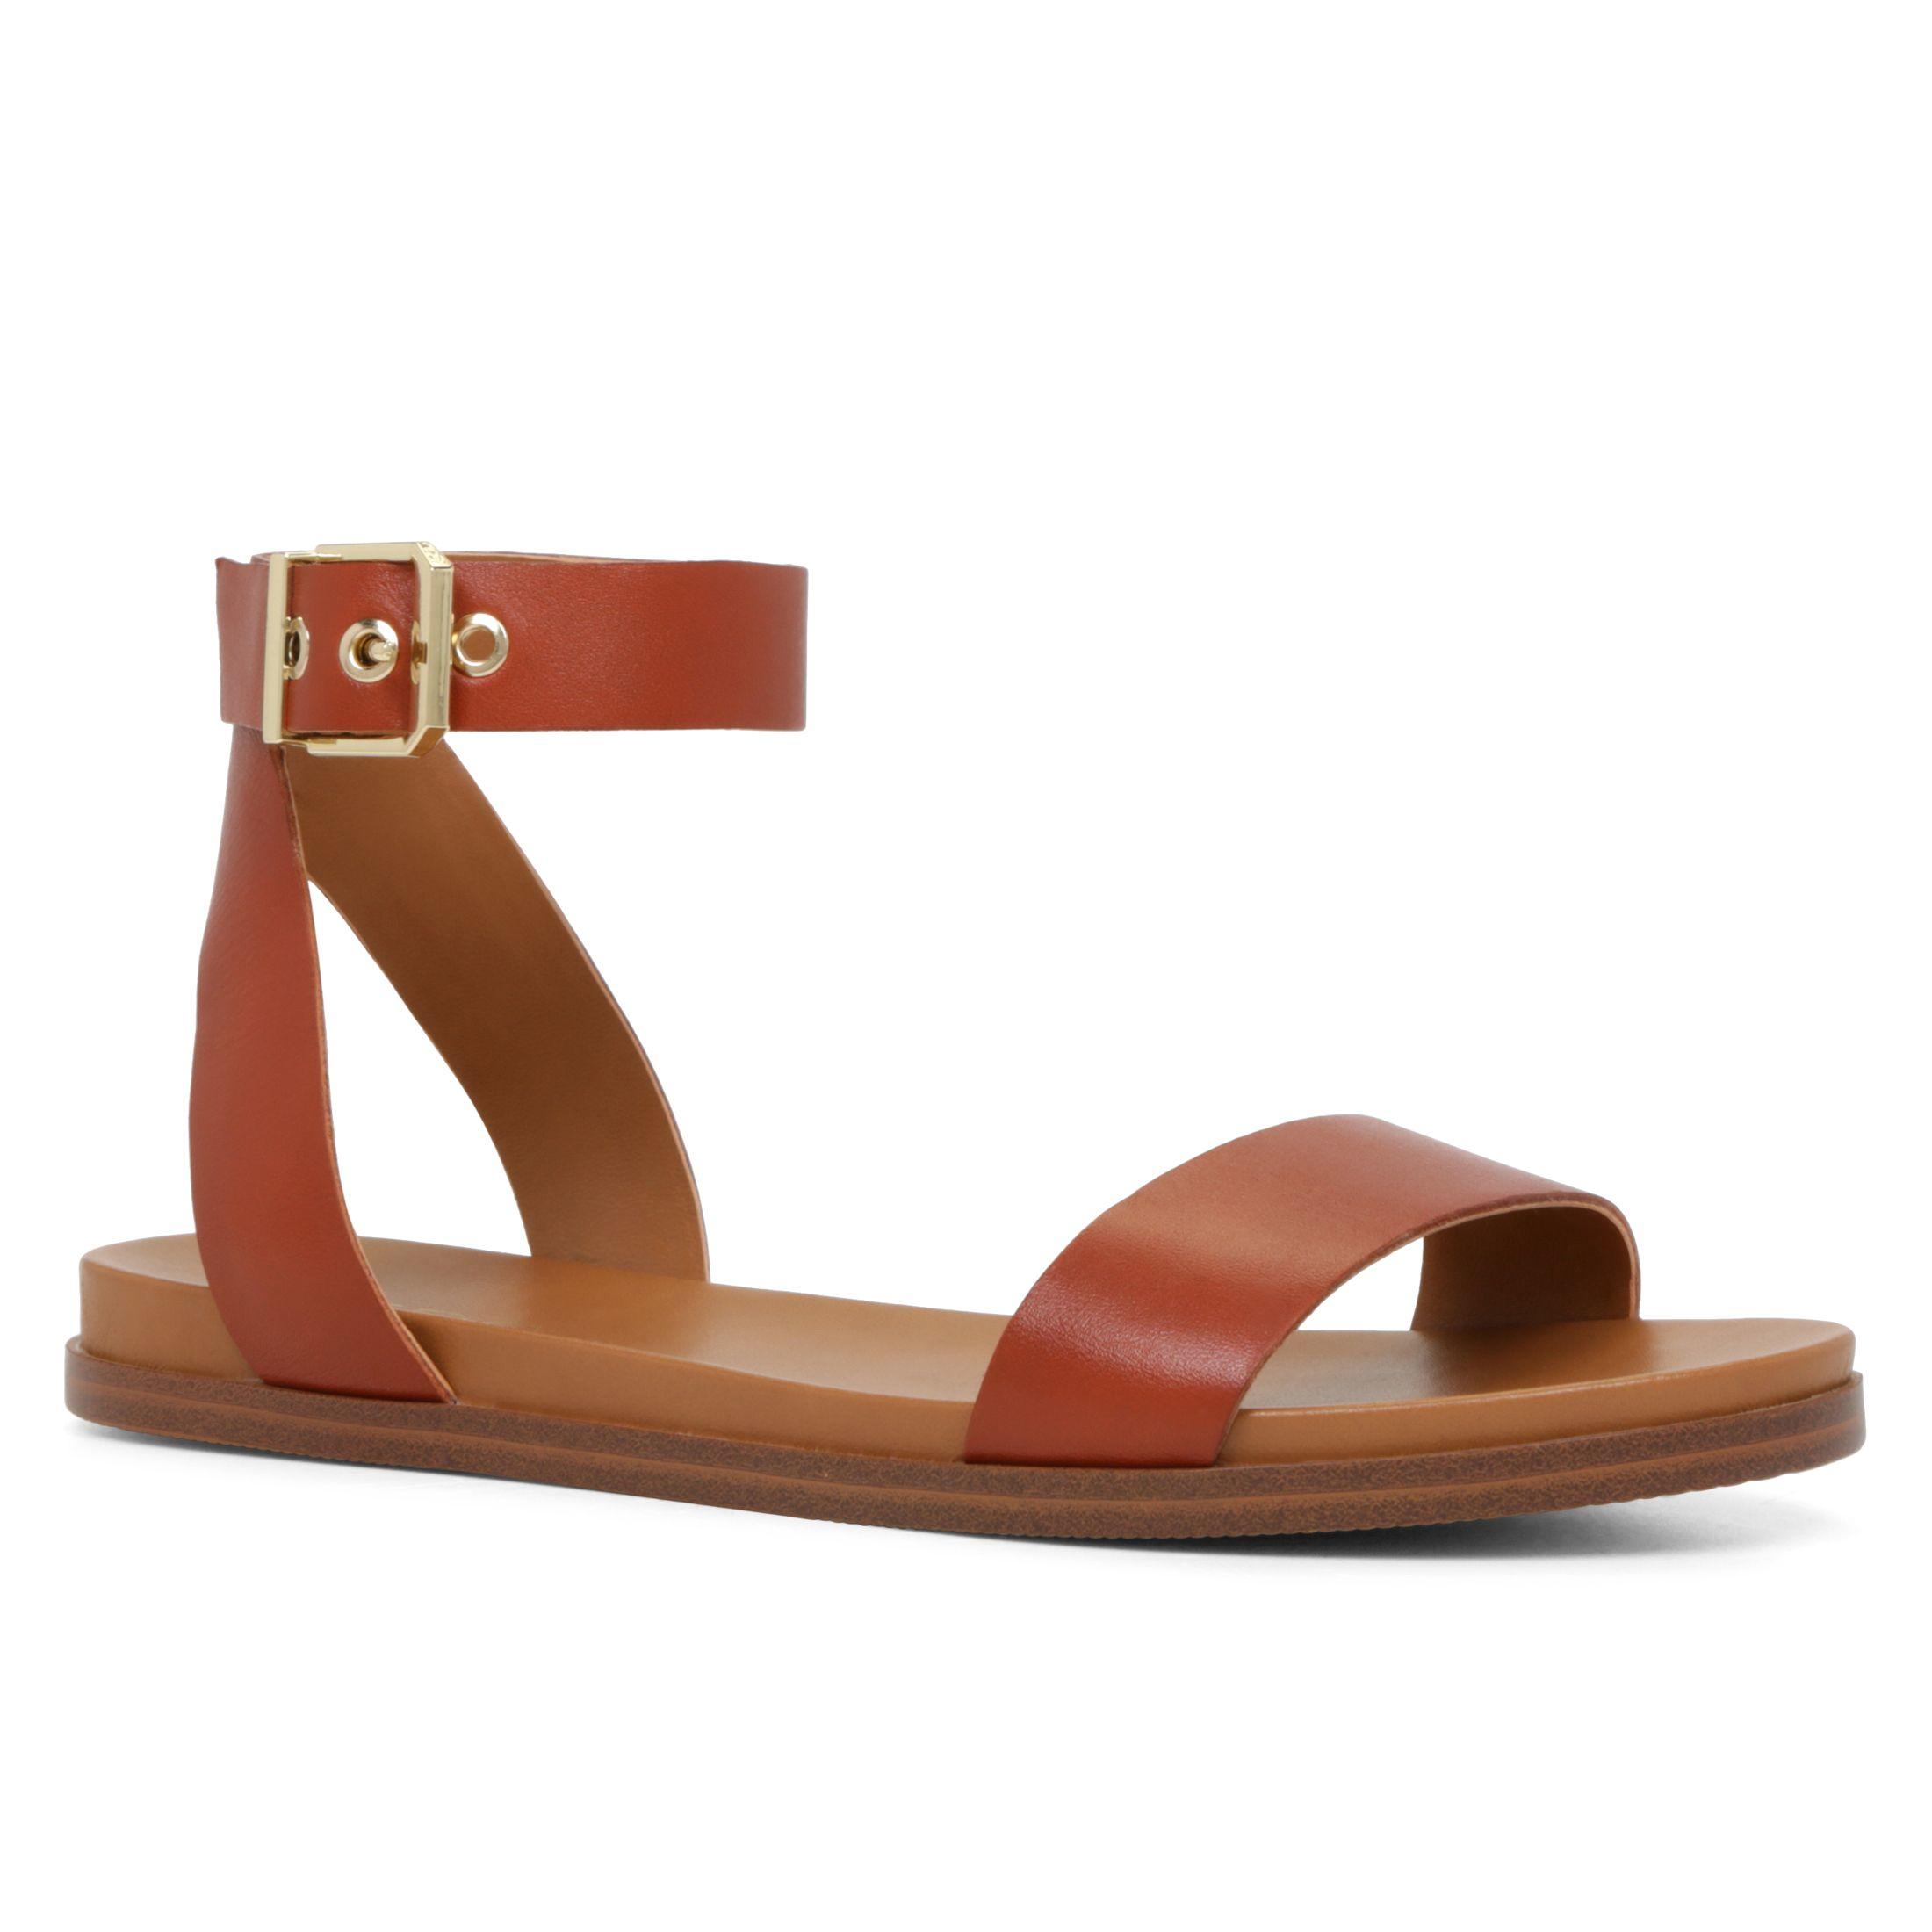 Aldo Erina Ankle Strap Sandals In Brown Lyst